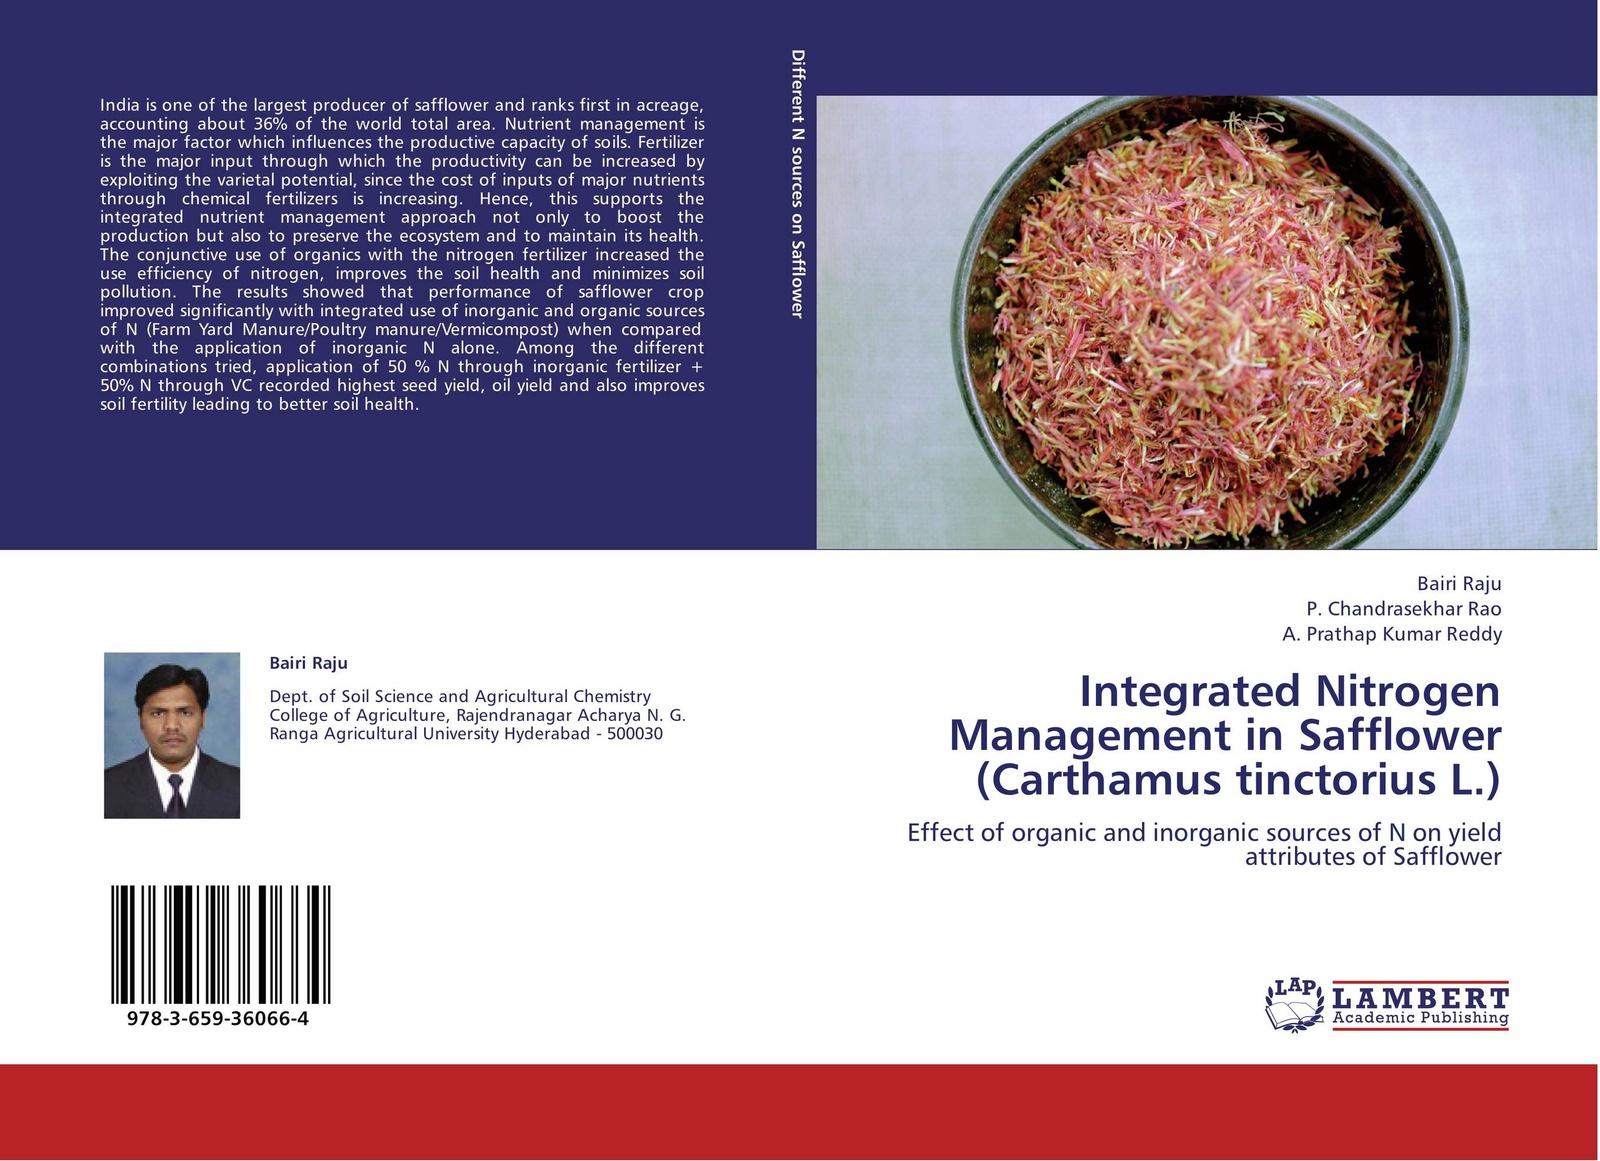 все цены на Bairi Raju,P. Chandrasekhar Rao and A. Prathap Kumar Reddy Integrated Nitrogen Management in Safflower (Carthamus tinctorius L.) онлайн